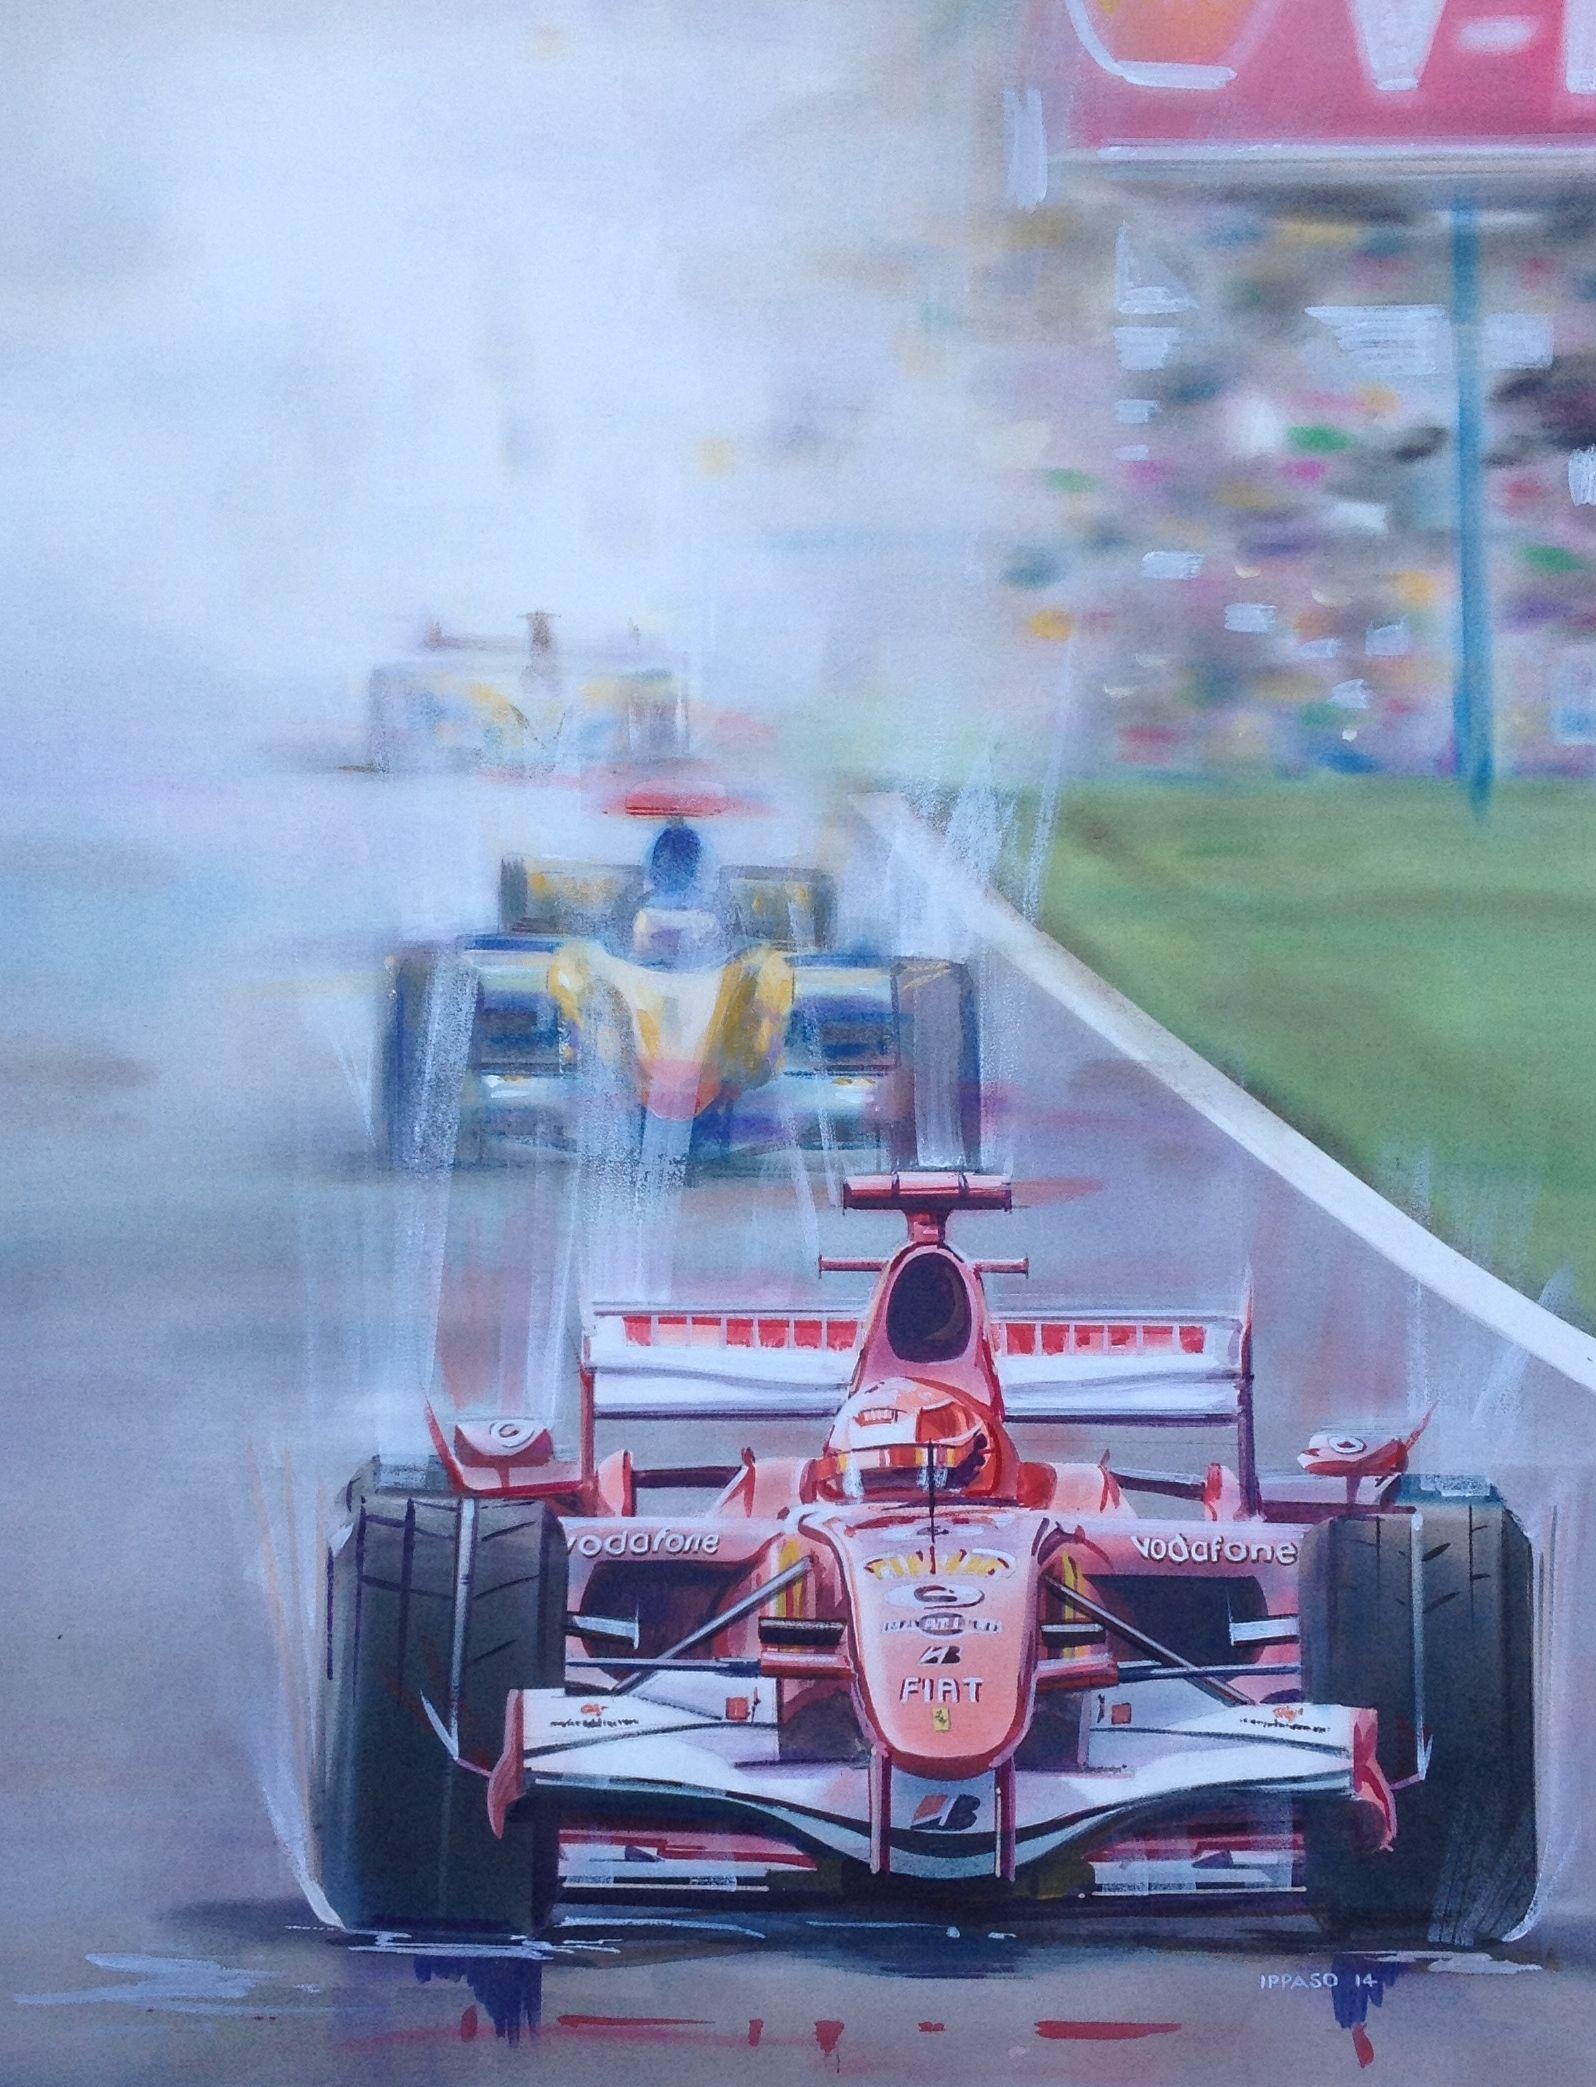 "Schumacher in Motion 40"" x 30"" Mixed Media Automotive"